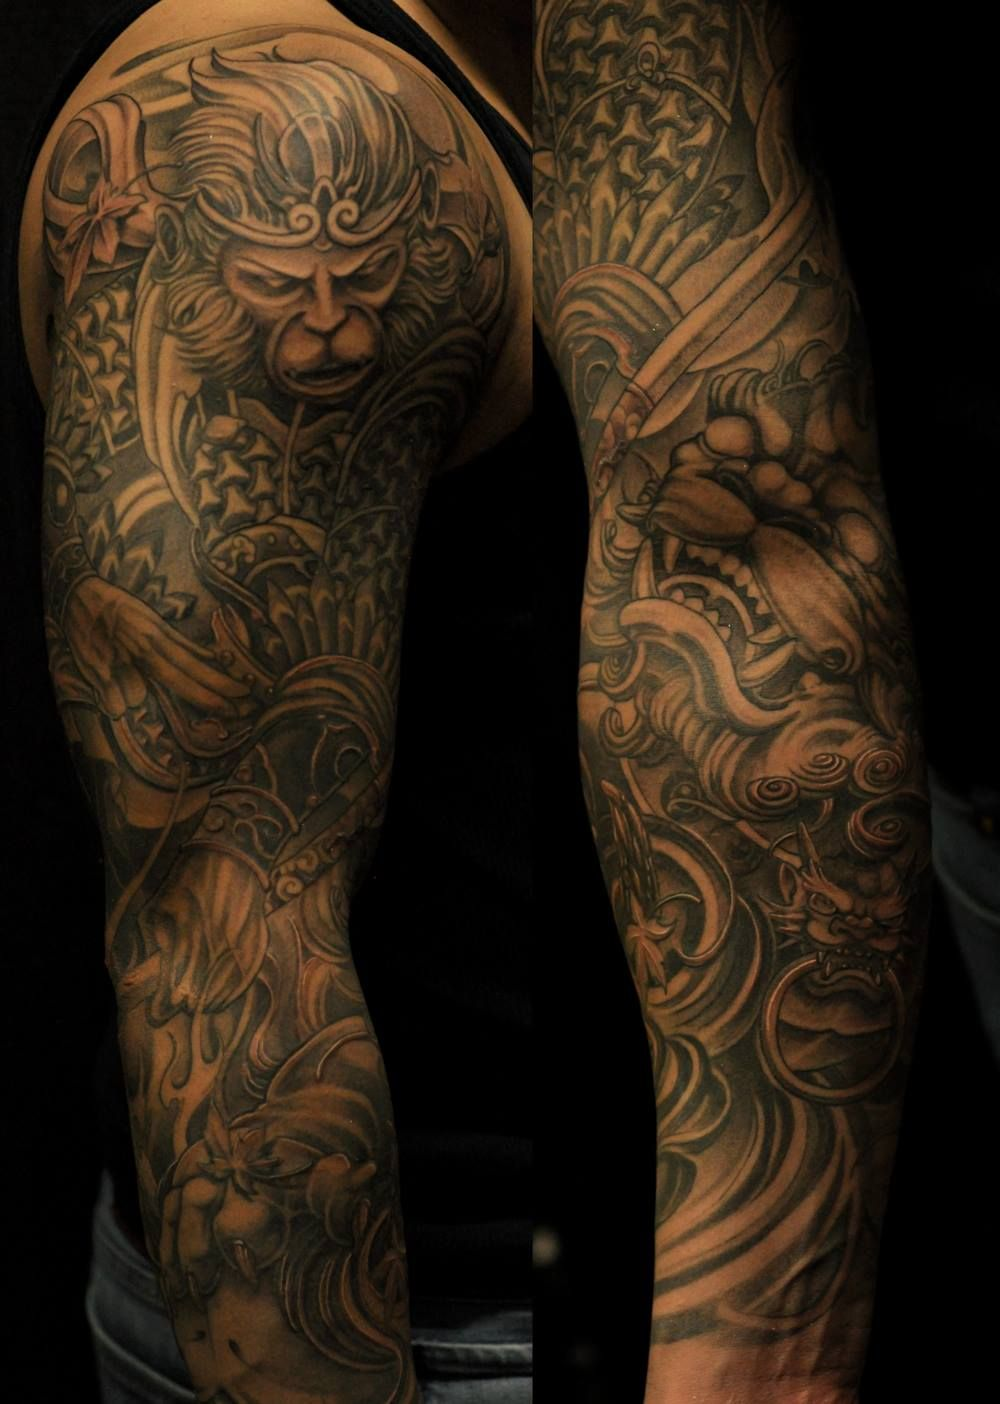 50abda561afd4 Chronic Ink Tattoo, Toronto Tattoo - Monkey king and foo dog full sleeve by  BKS